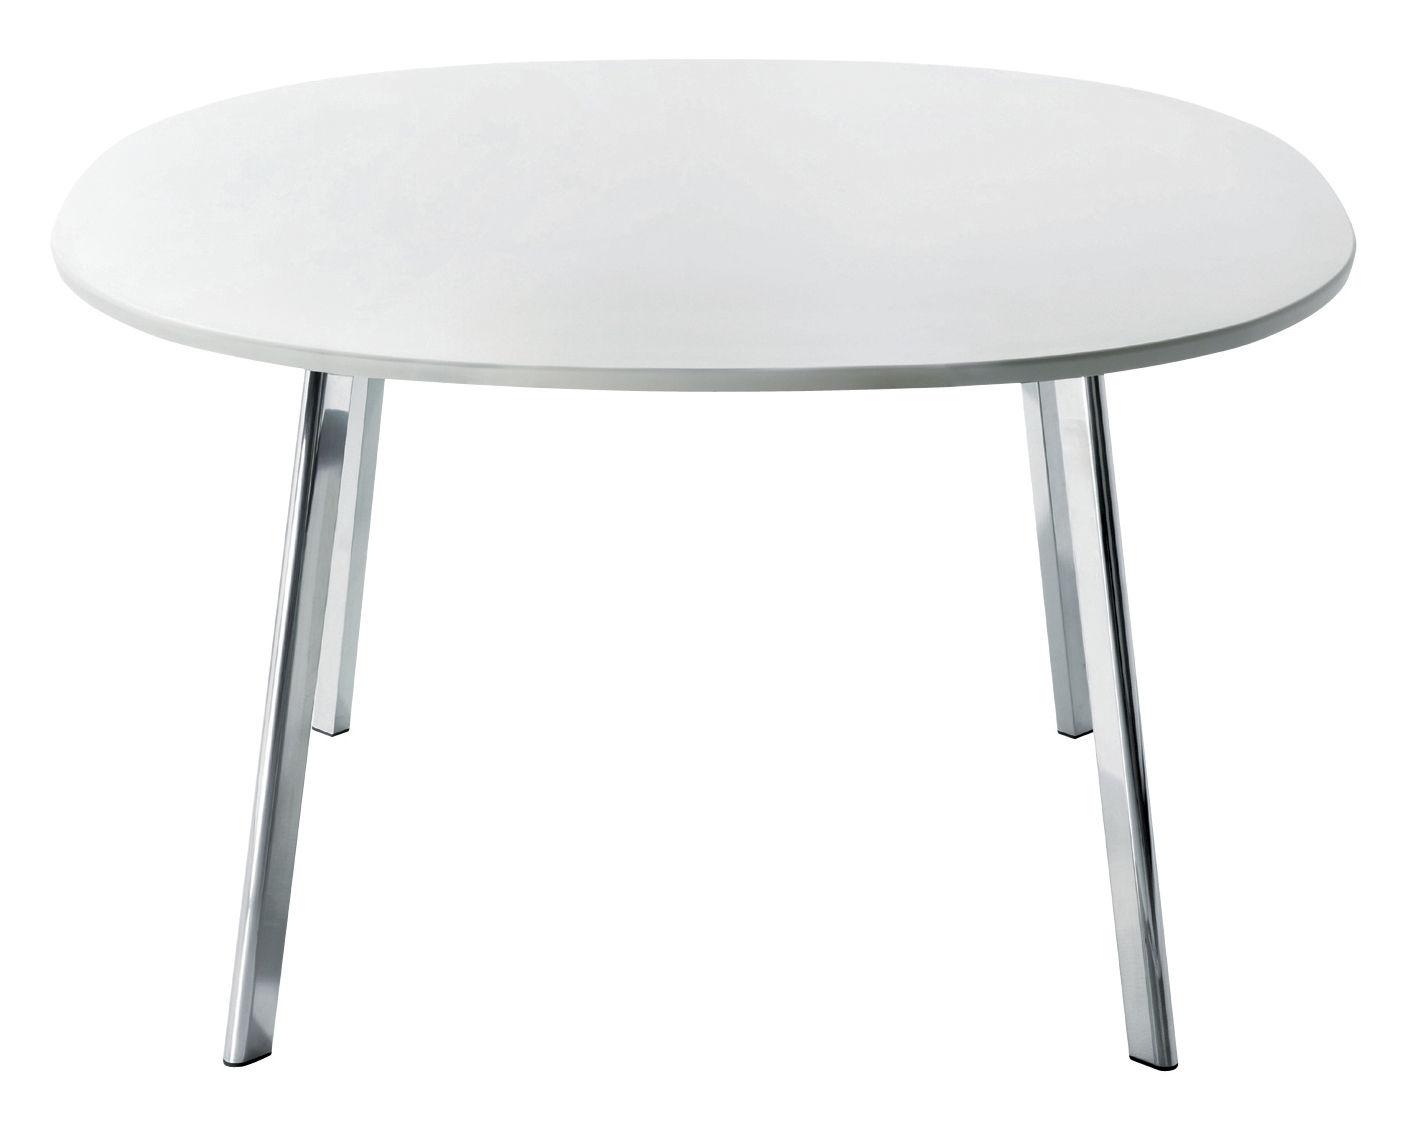 D j vu table 98 cm 98x98 white top by magis for Magis deja vu